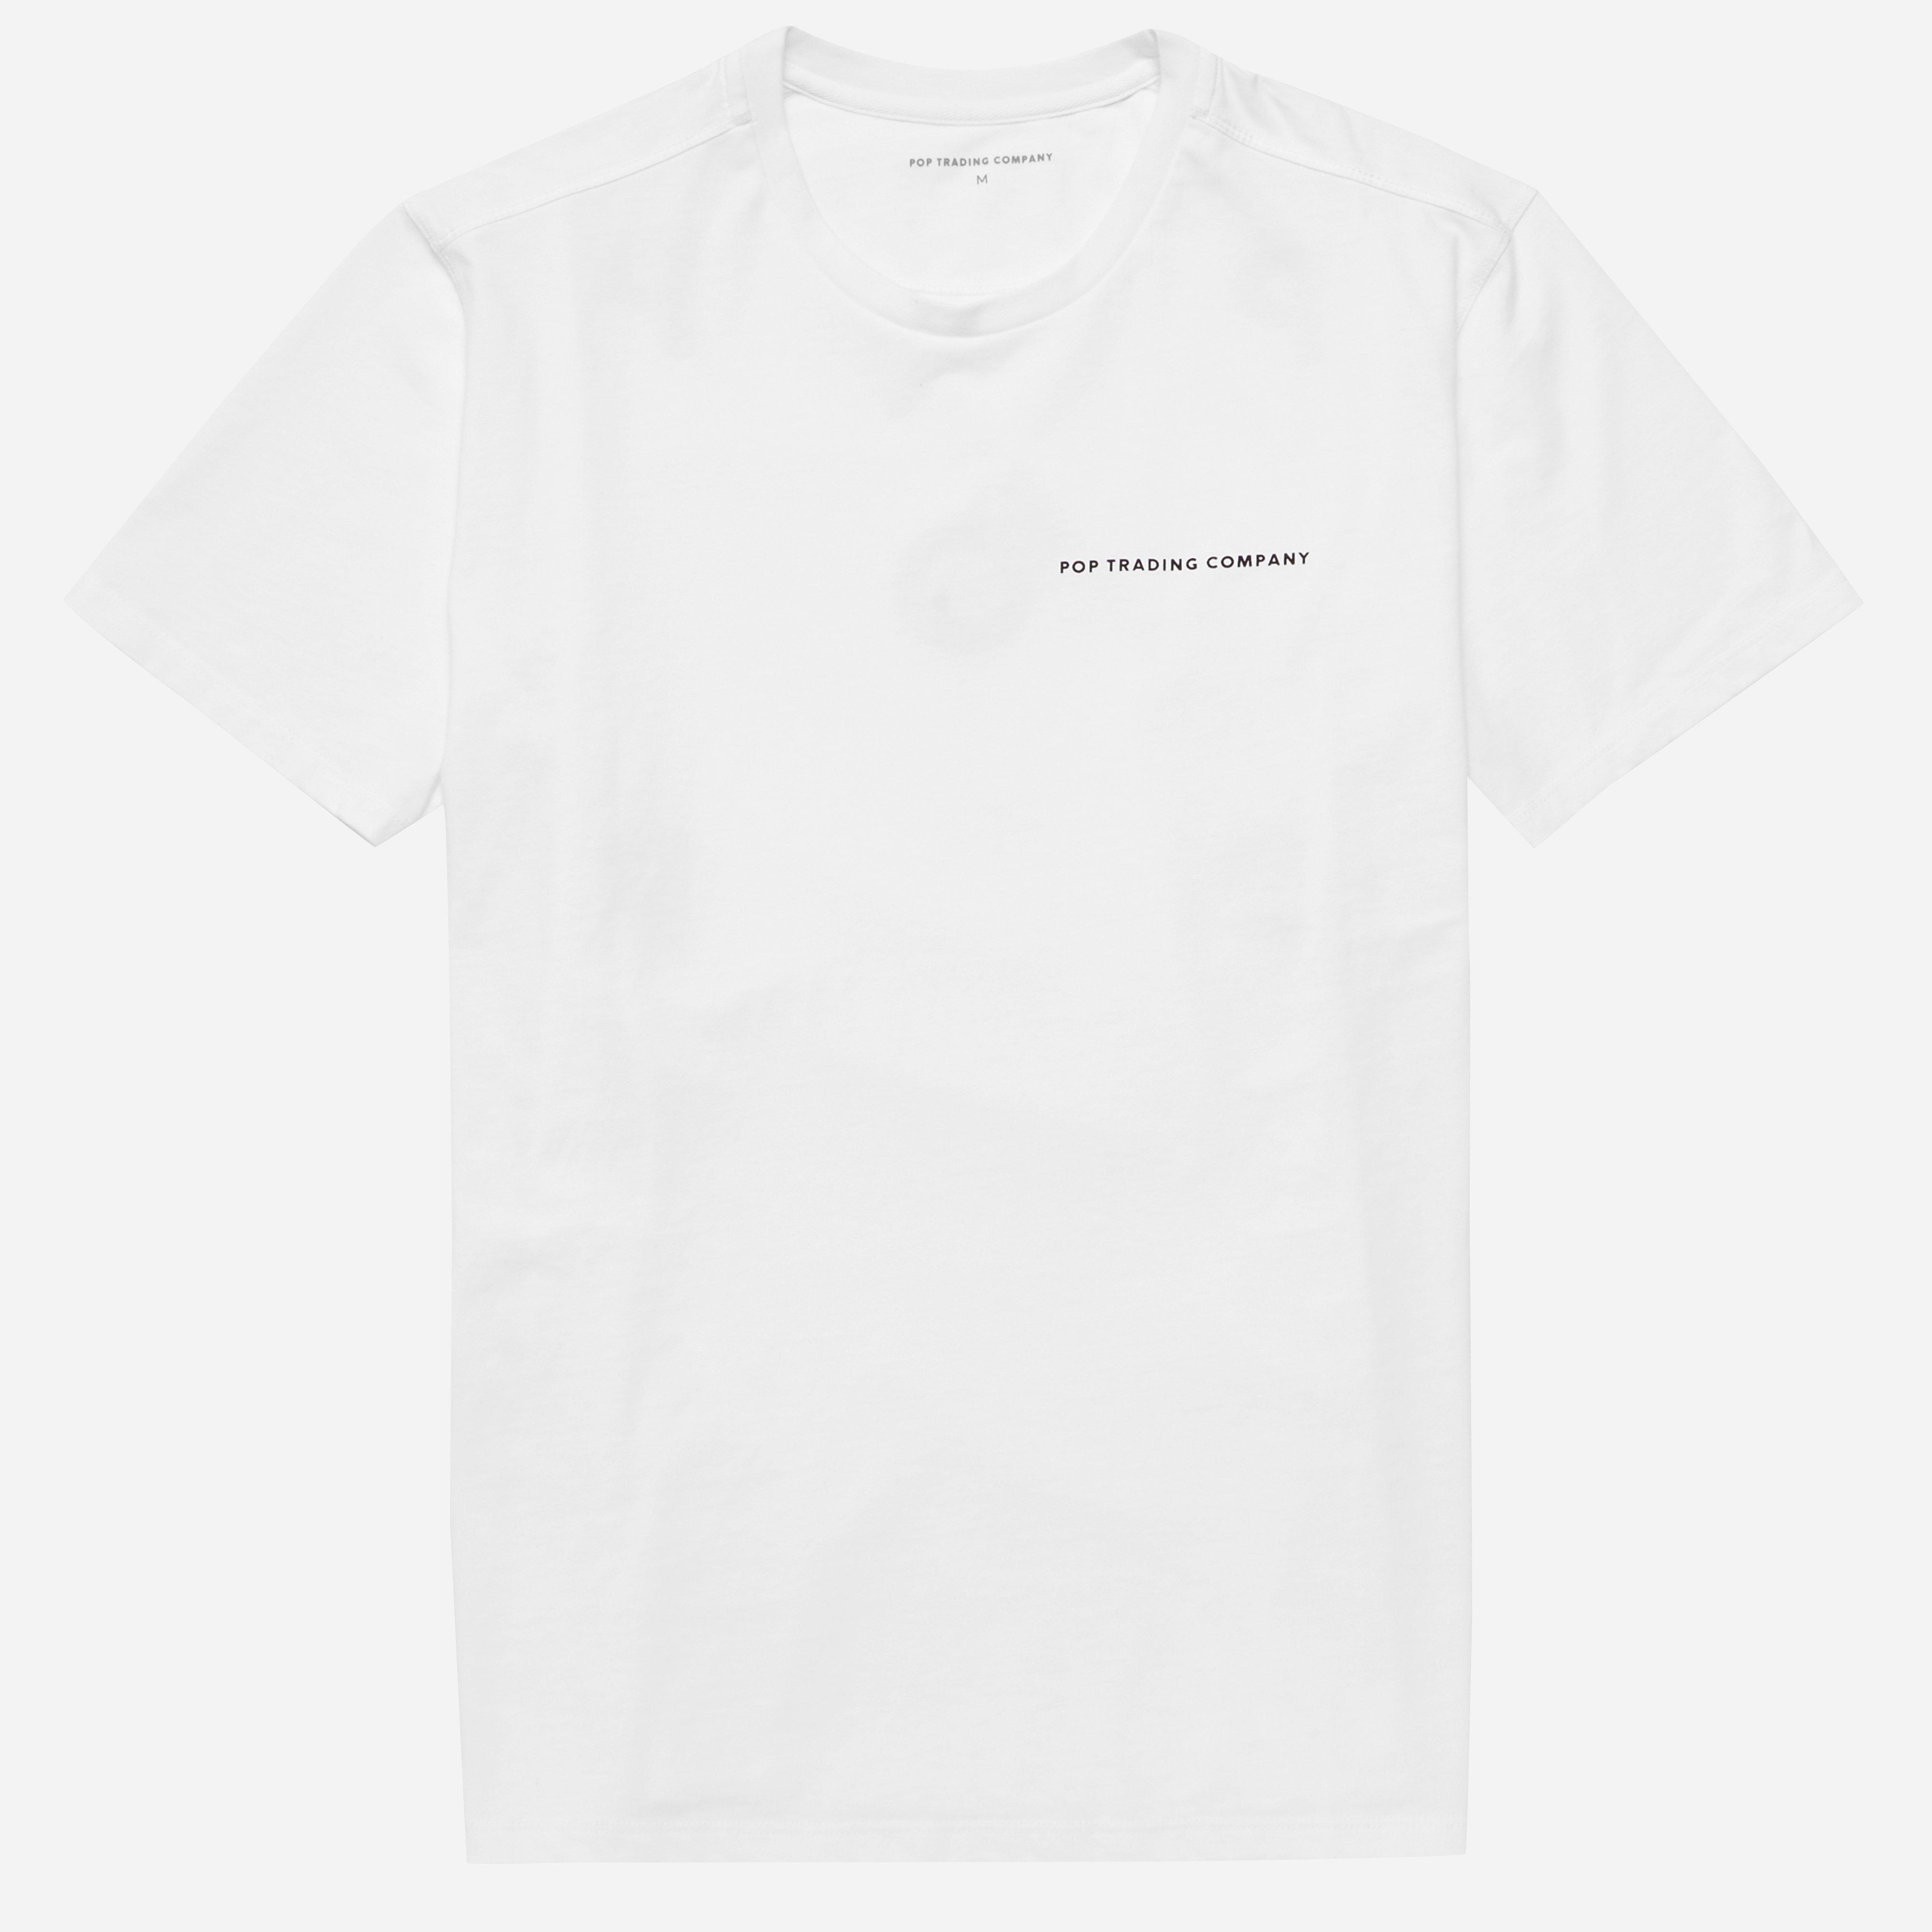 Pop Trading Company Olive T-shirt